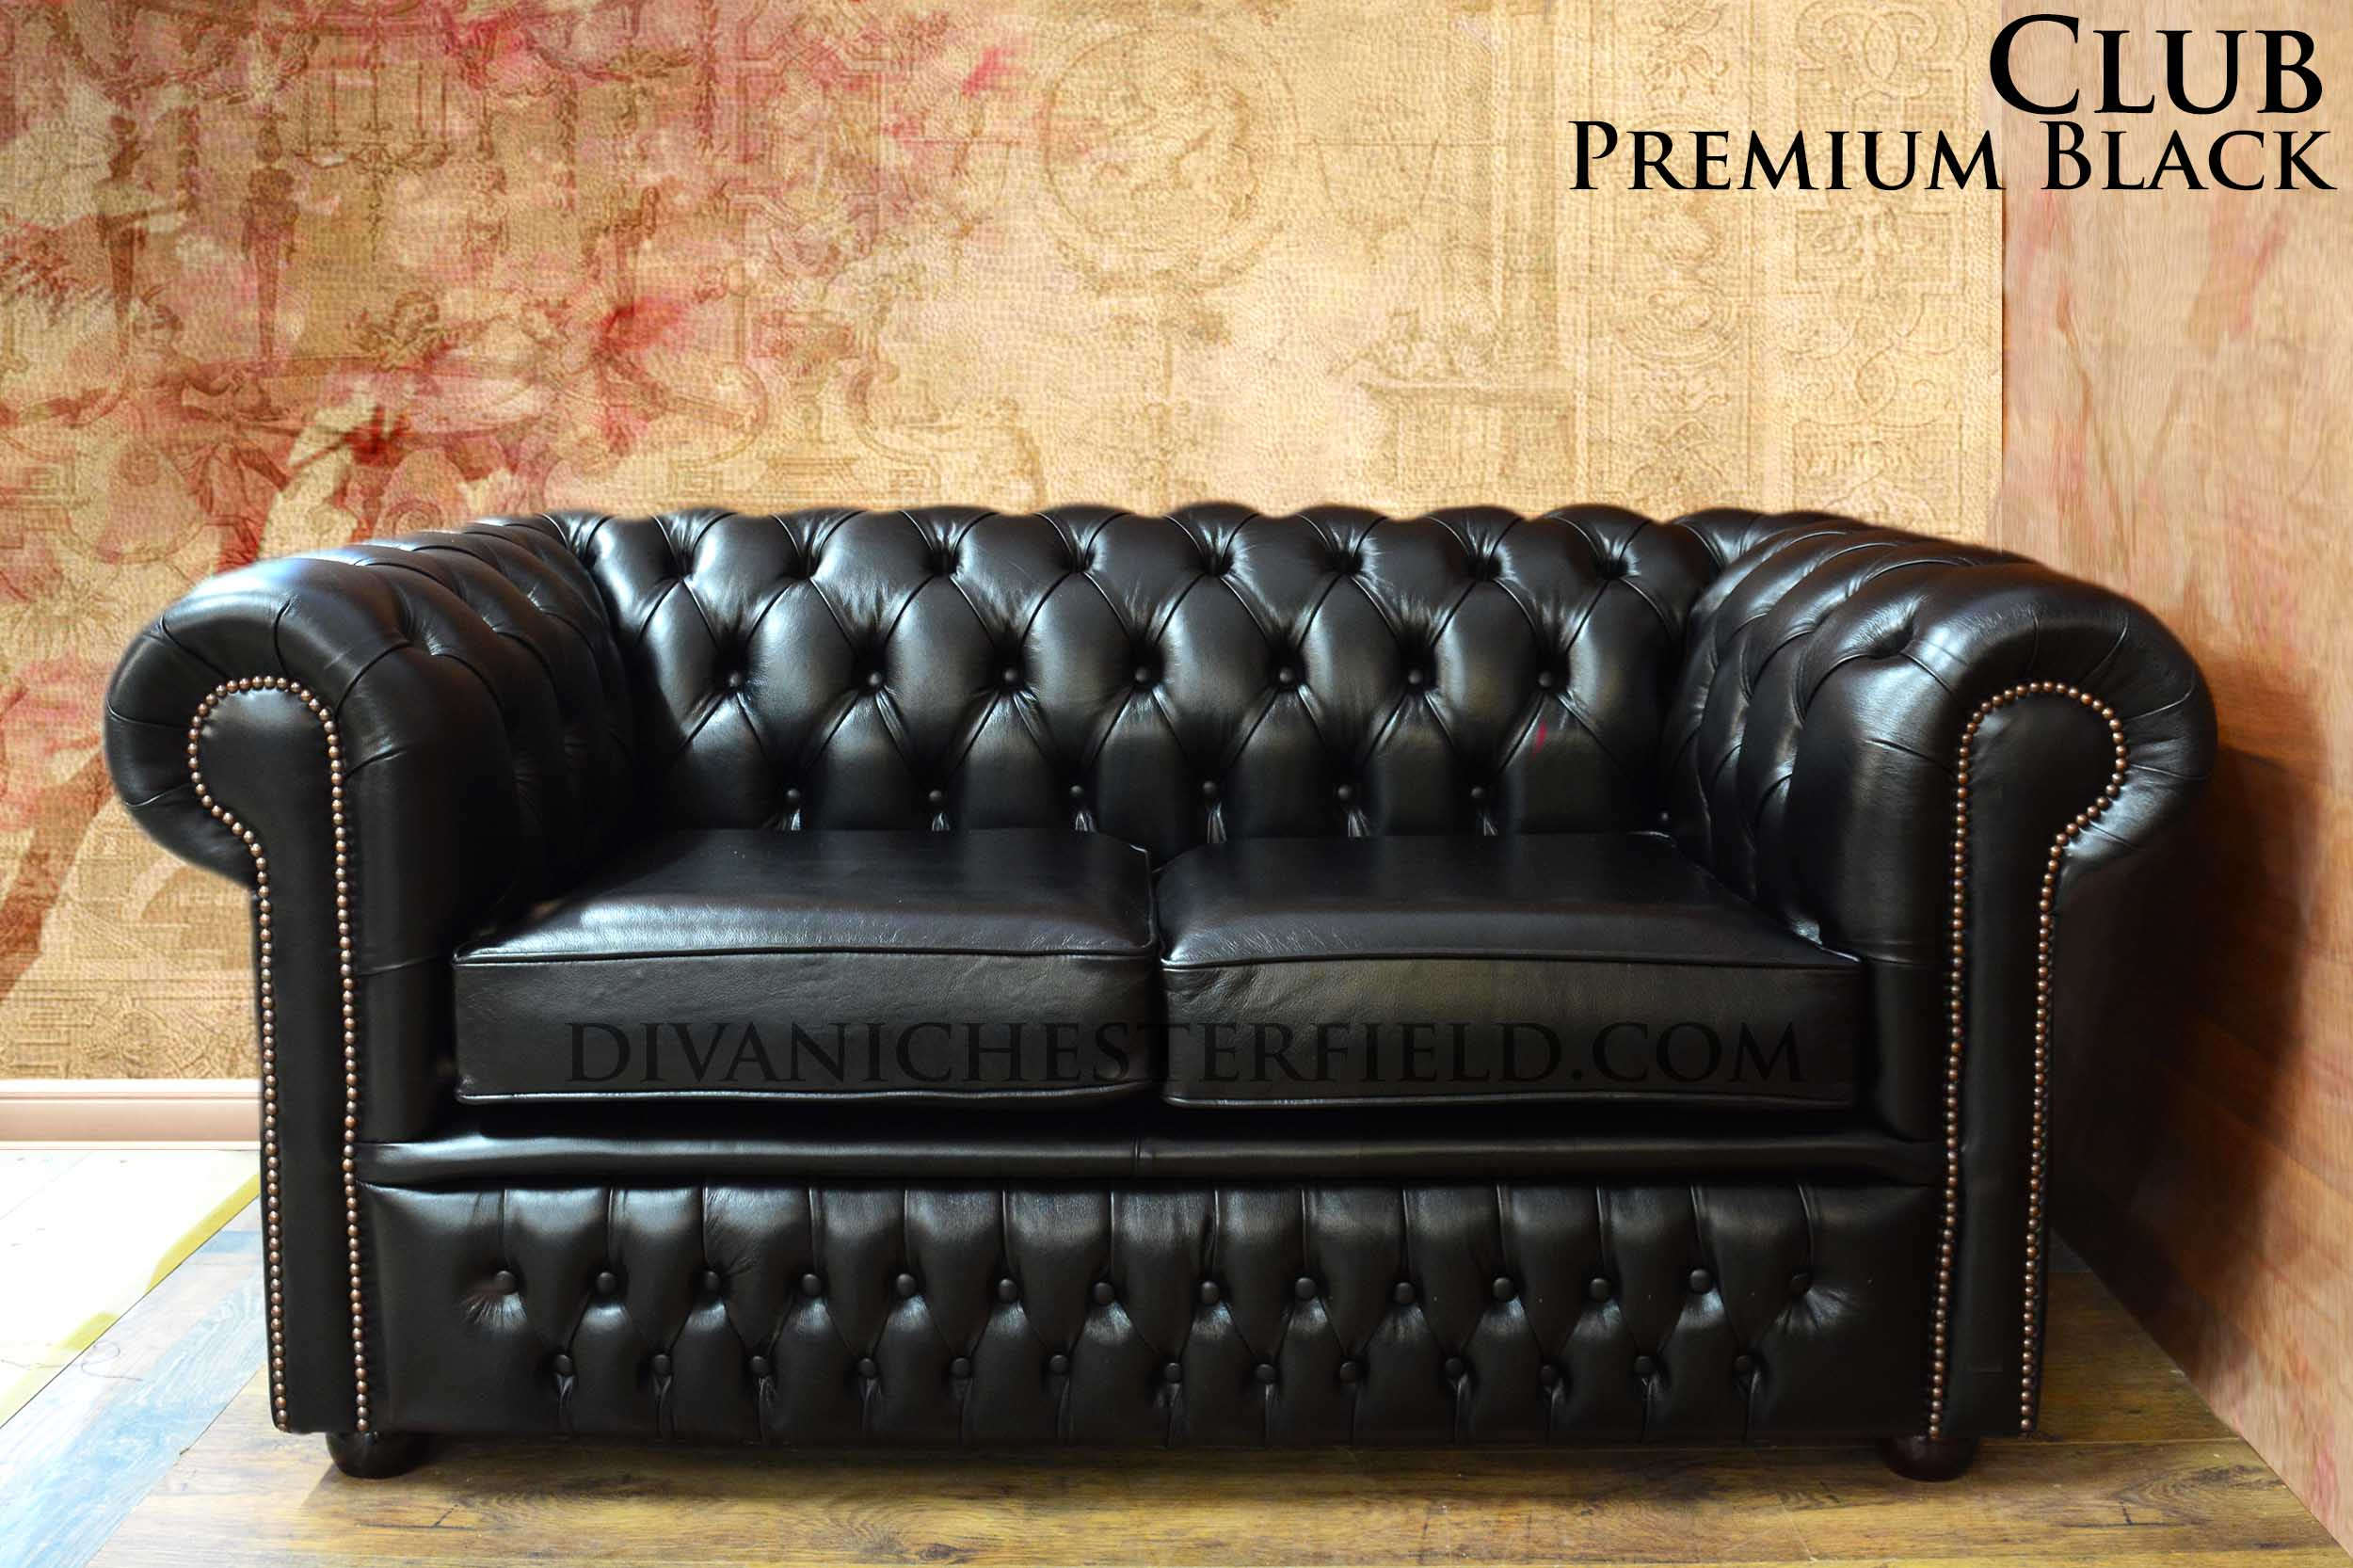 Chester divano prezzo good divano chester verde usato vedi tutte i prezzi with chester divano - Divano chester frau prezzo ...